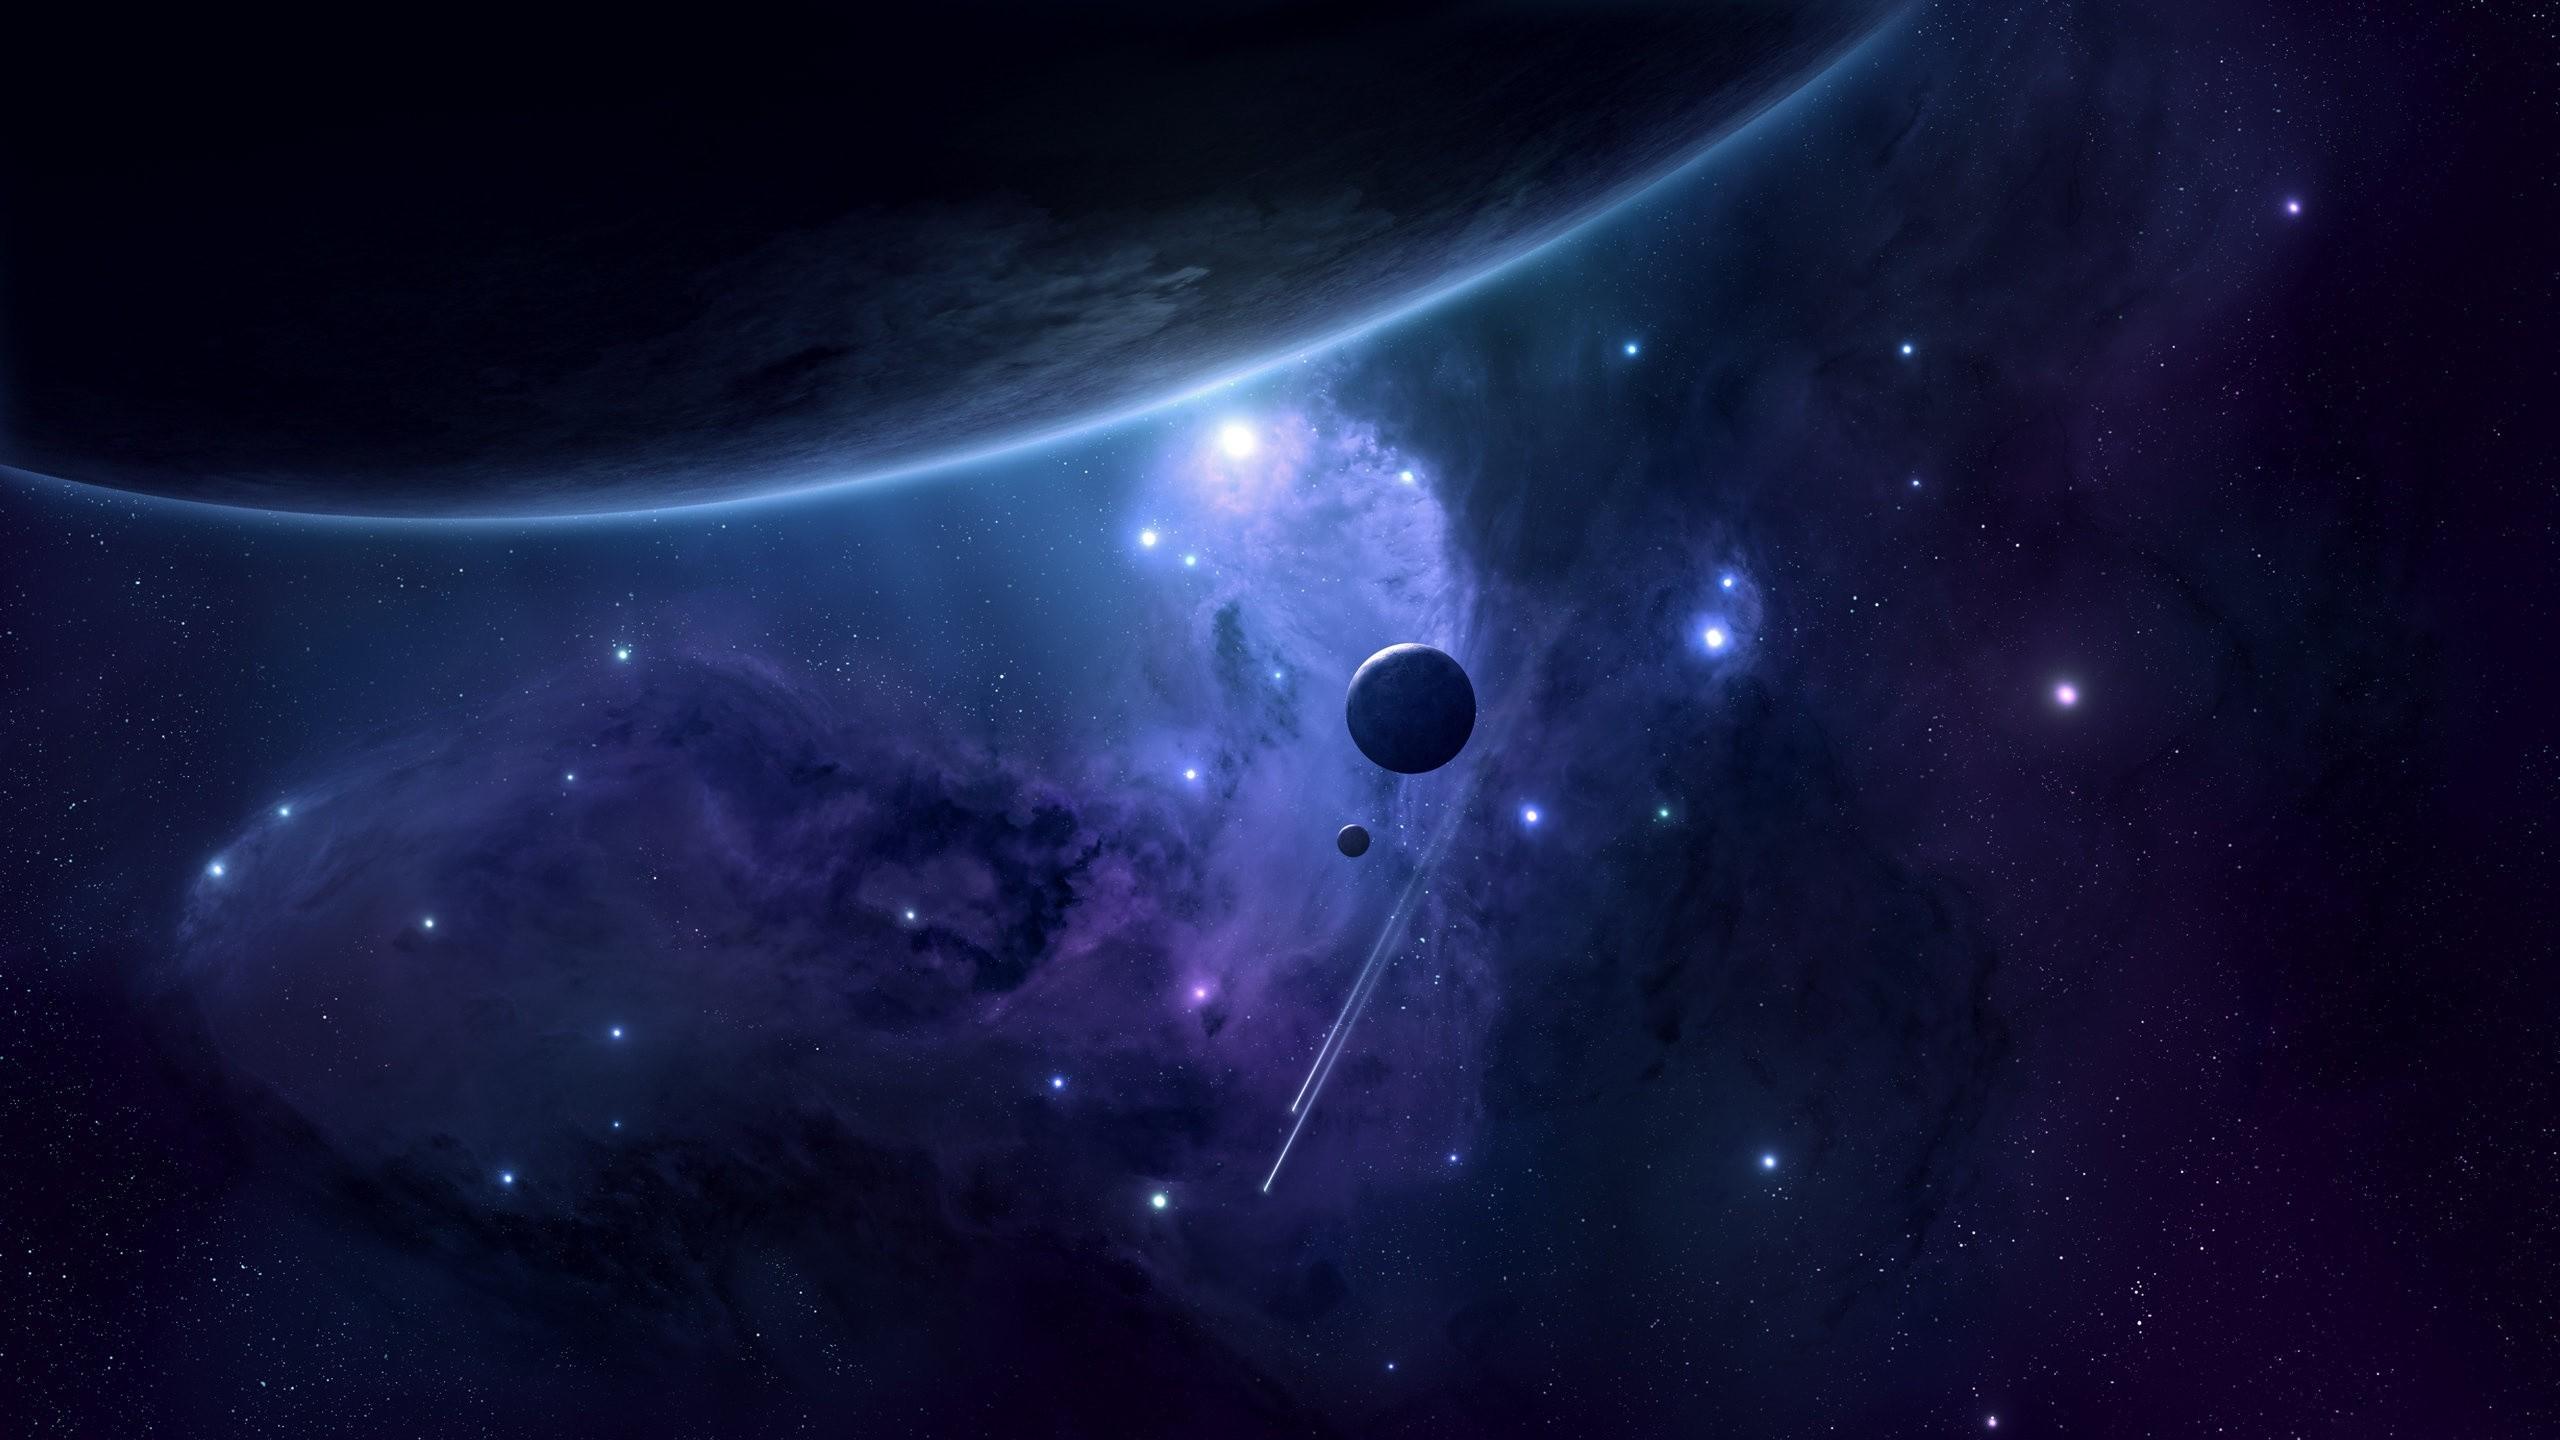 Wallpaper space, planets, satellites, stars, deep